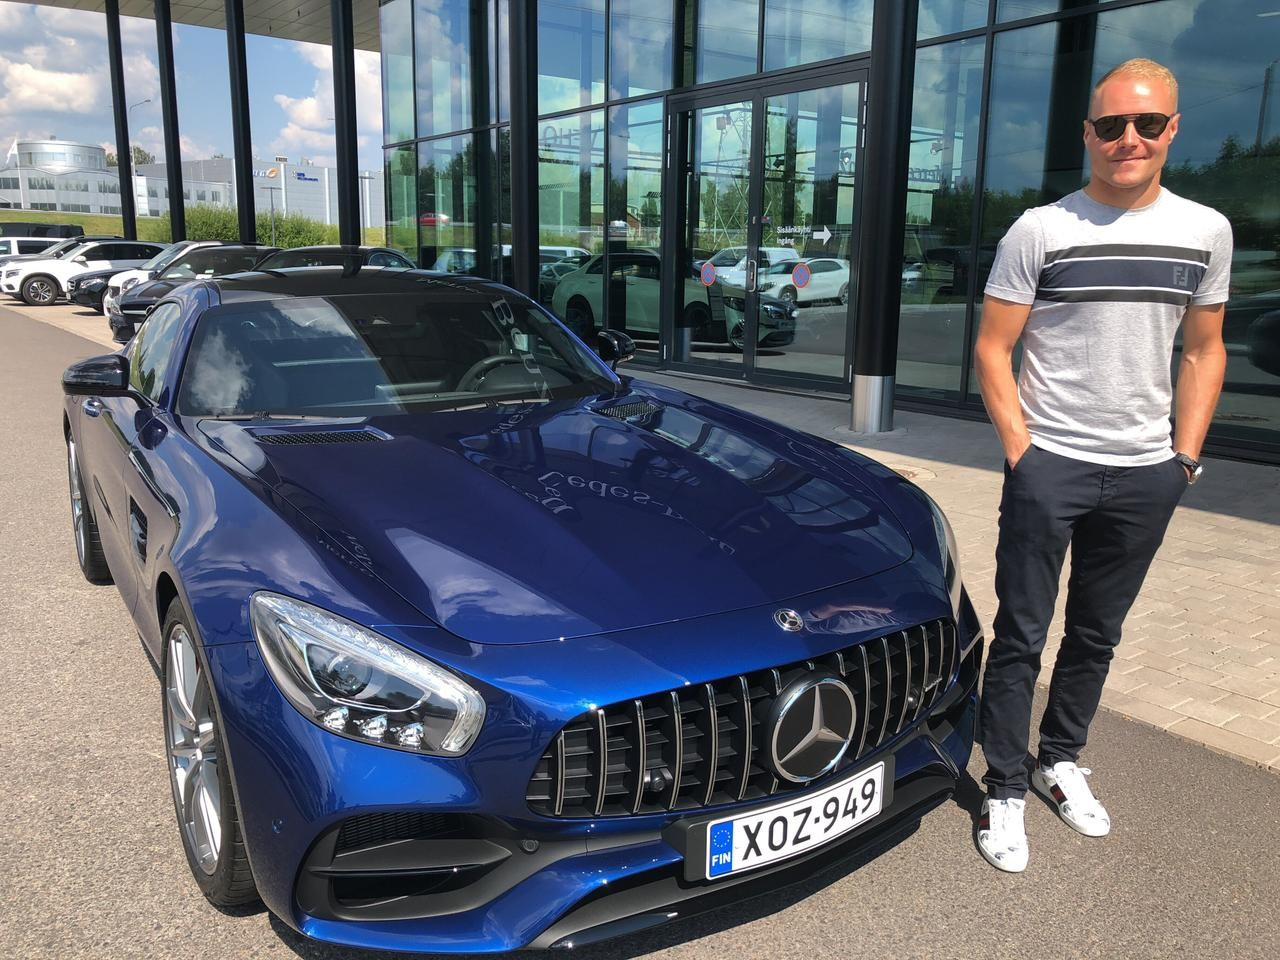 Valtteri-Bottas-Mercedes-AMG-GT-S-1